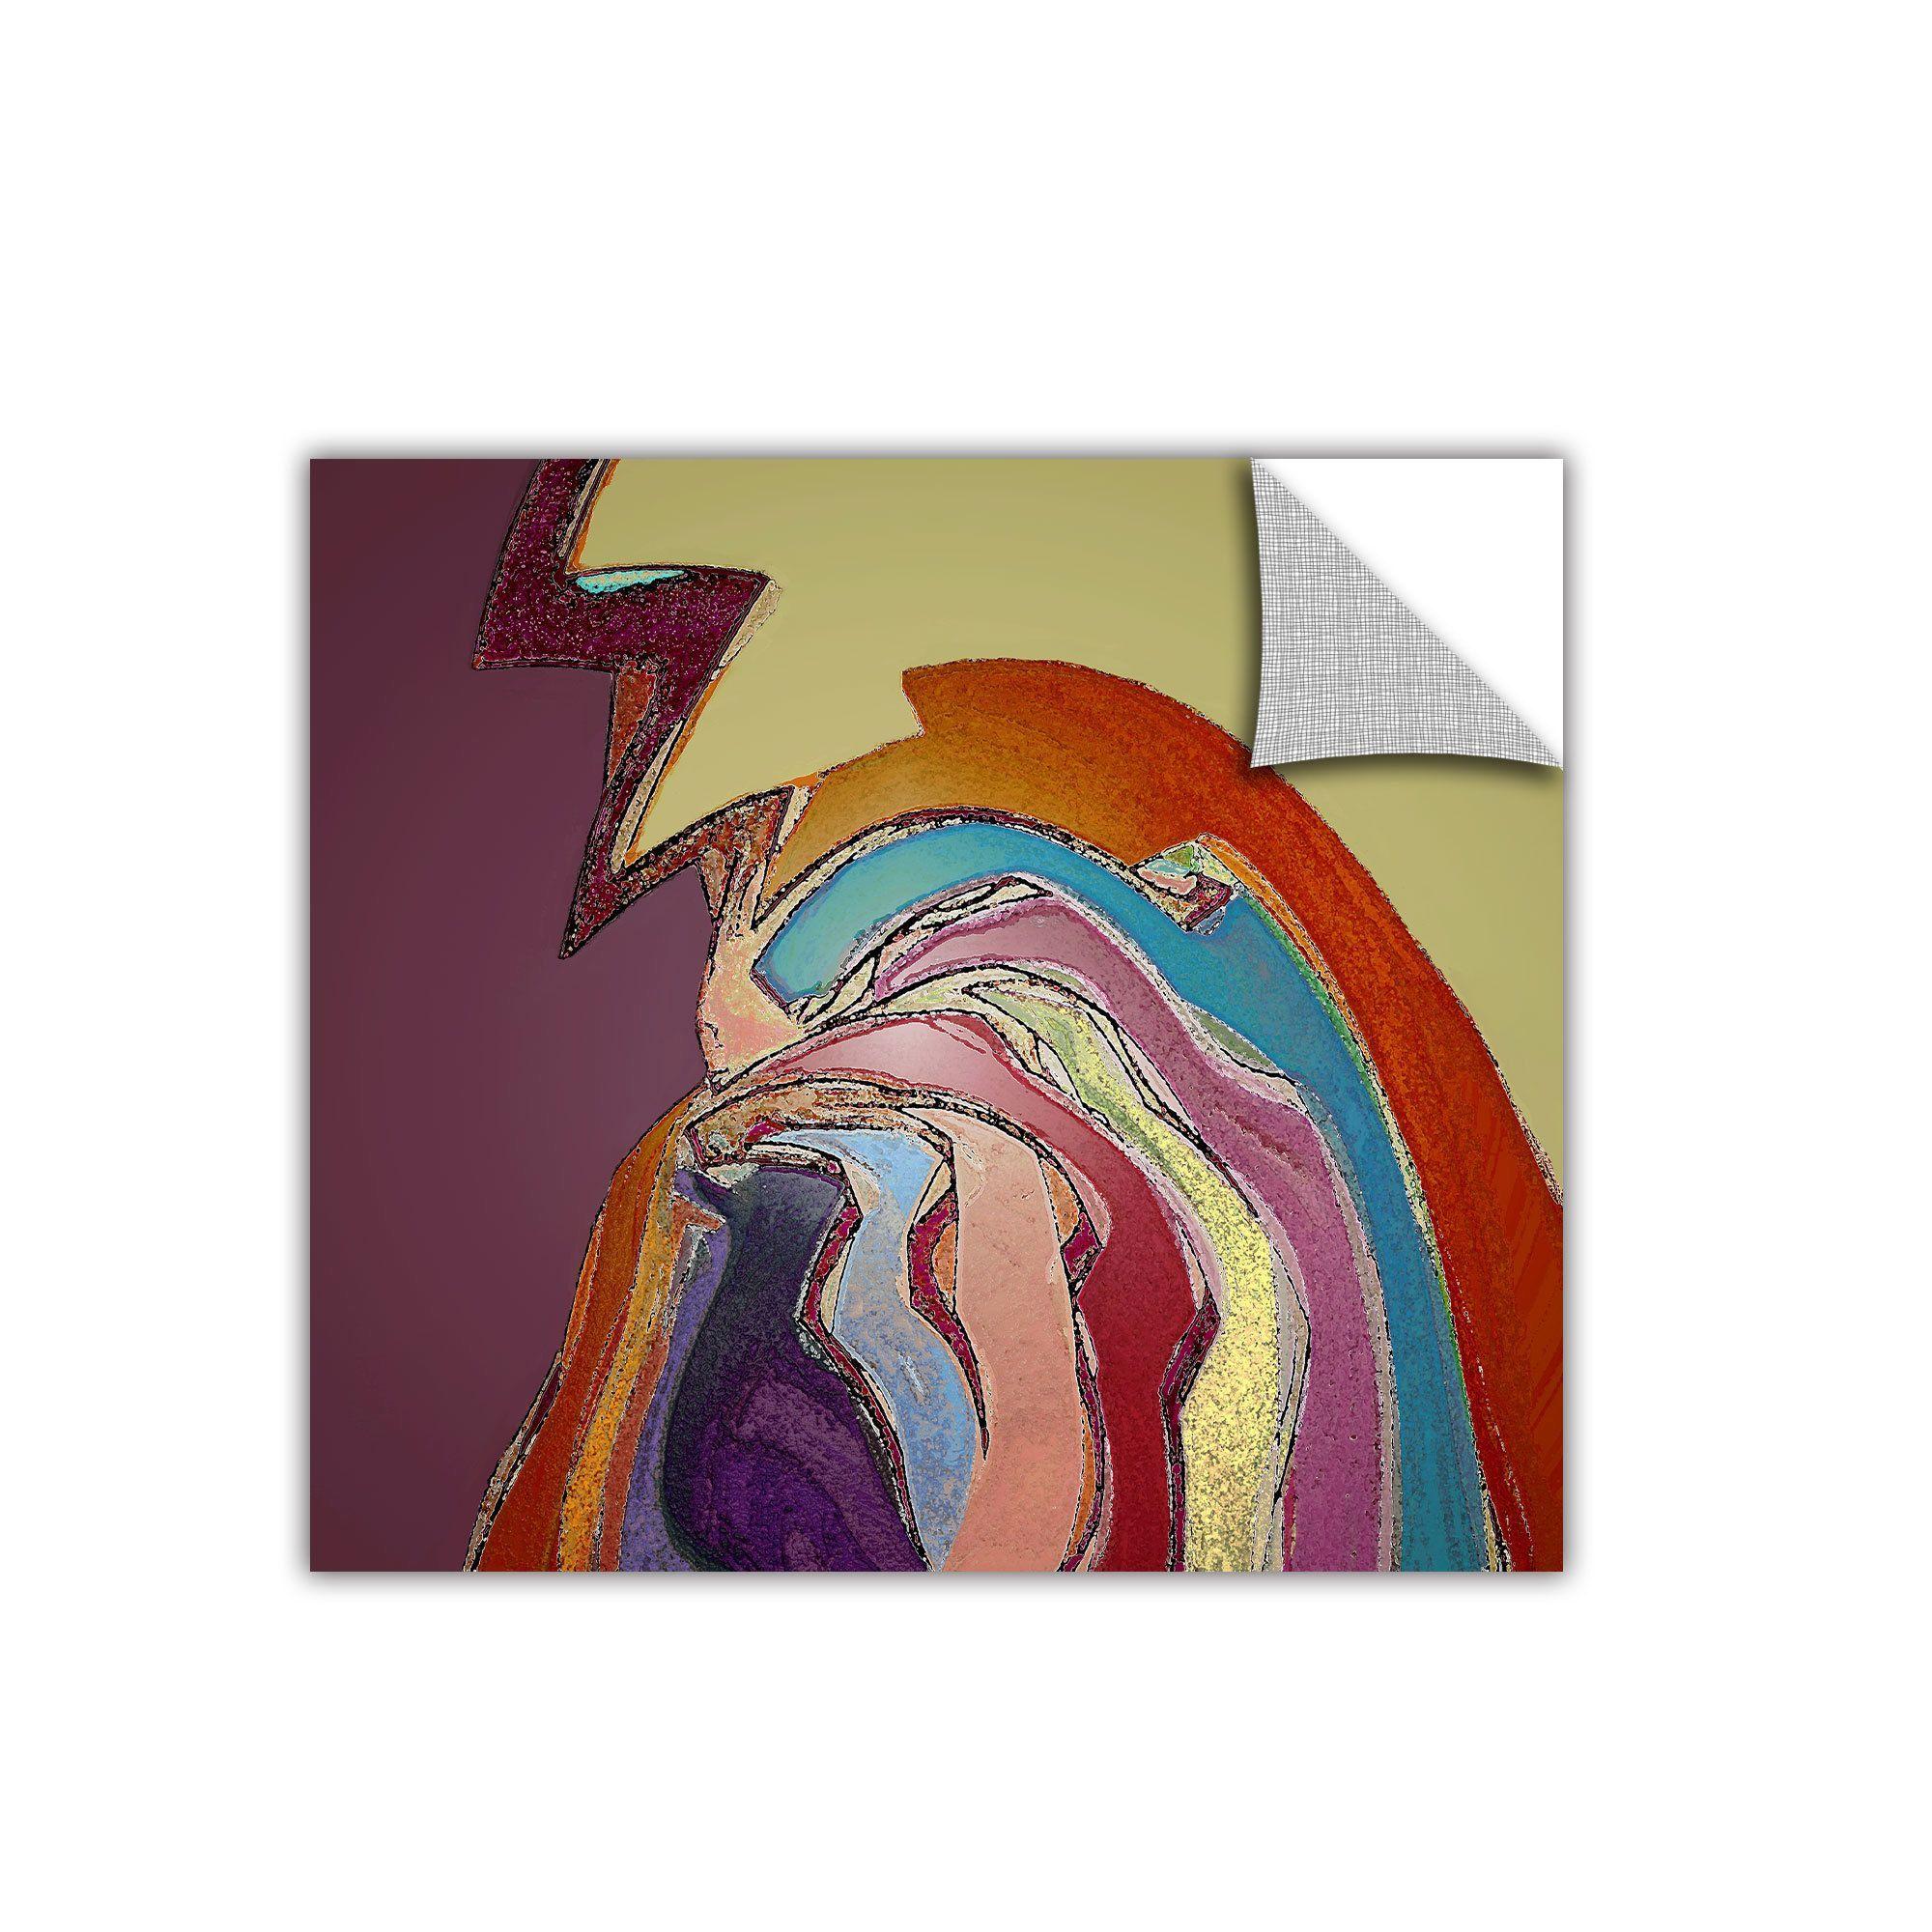 Removable wall art graphic - Artwall Dean Uhlinger Bandada Flock Art Appeelz Removable Wall Art Graphic